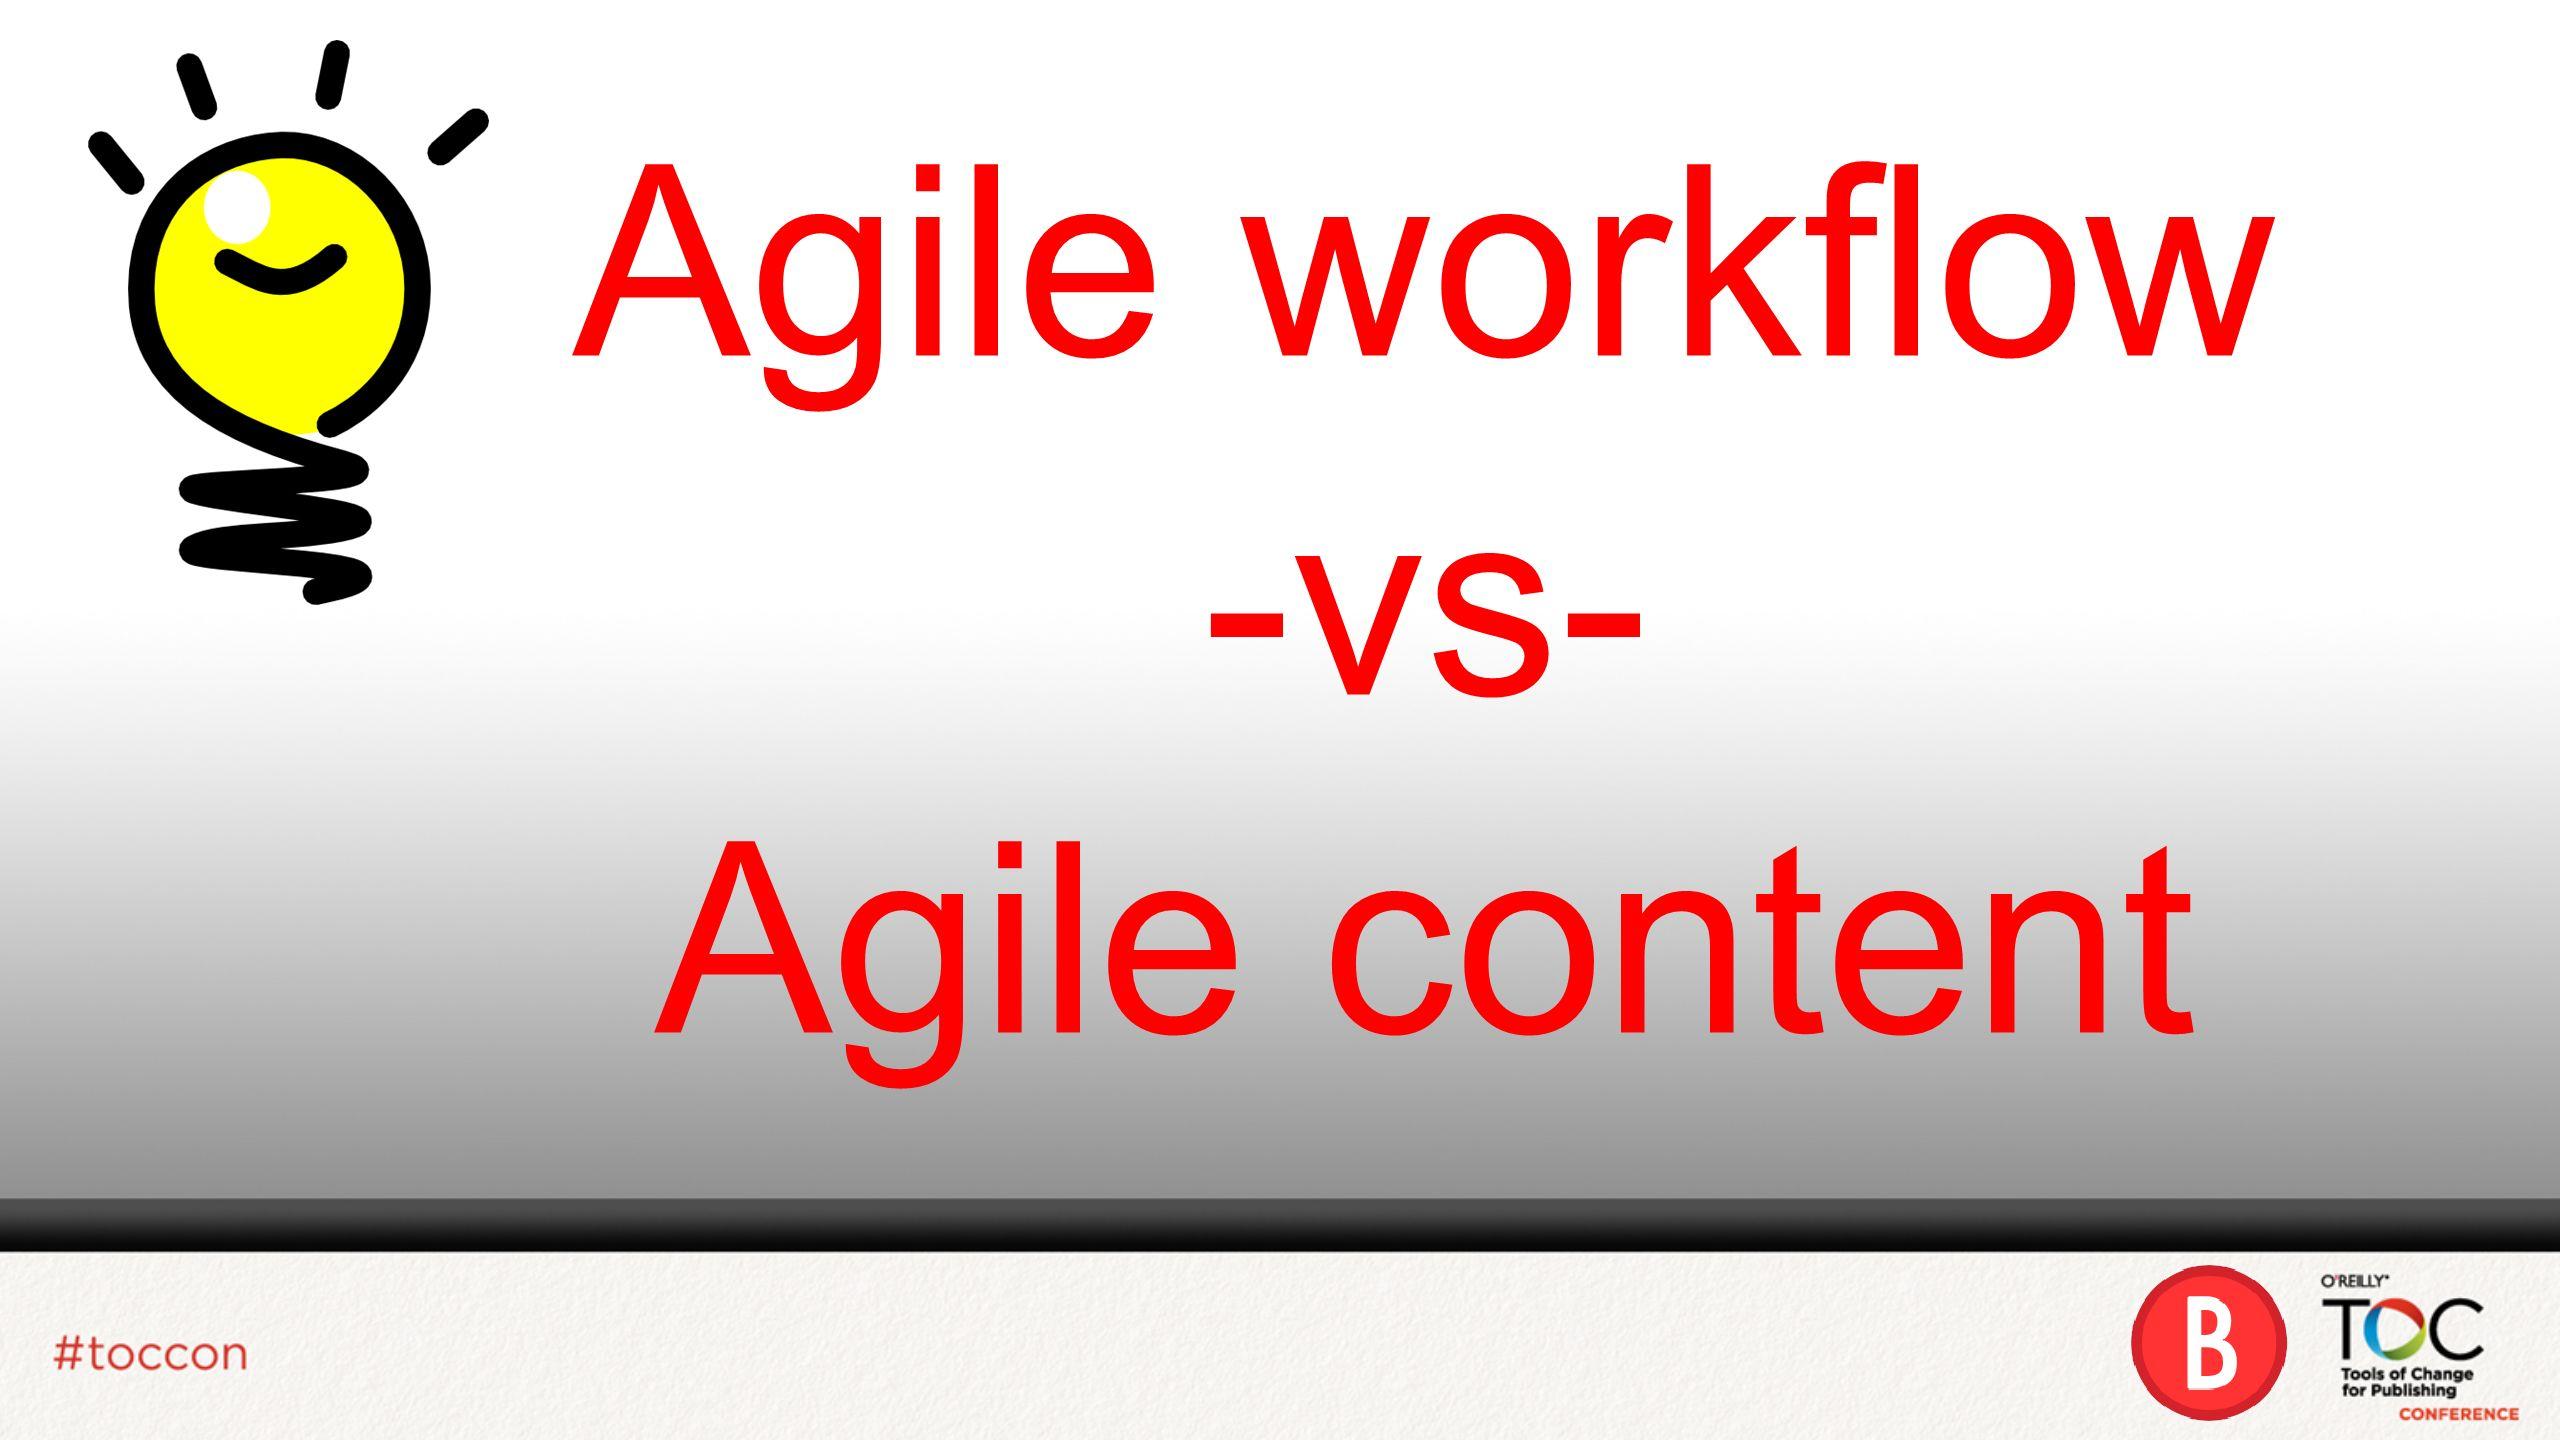 Agile workflow -vs- Agile content